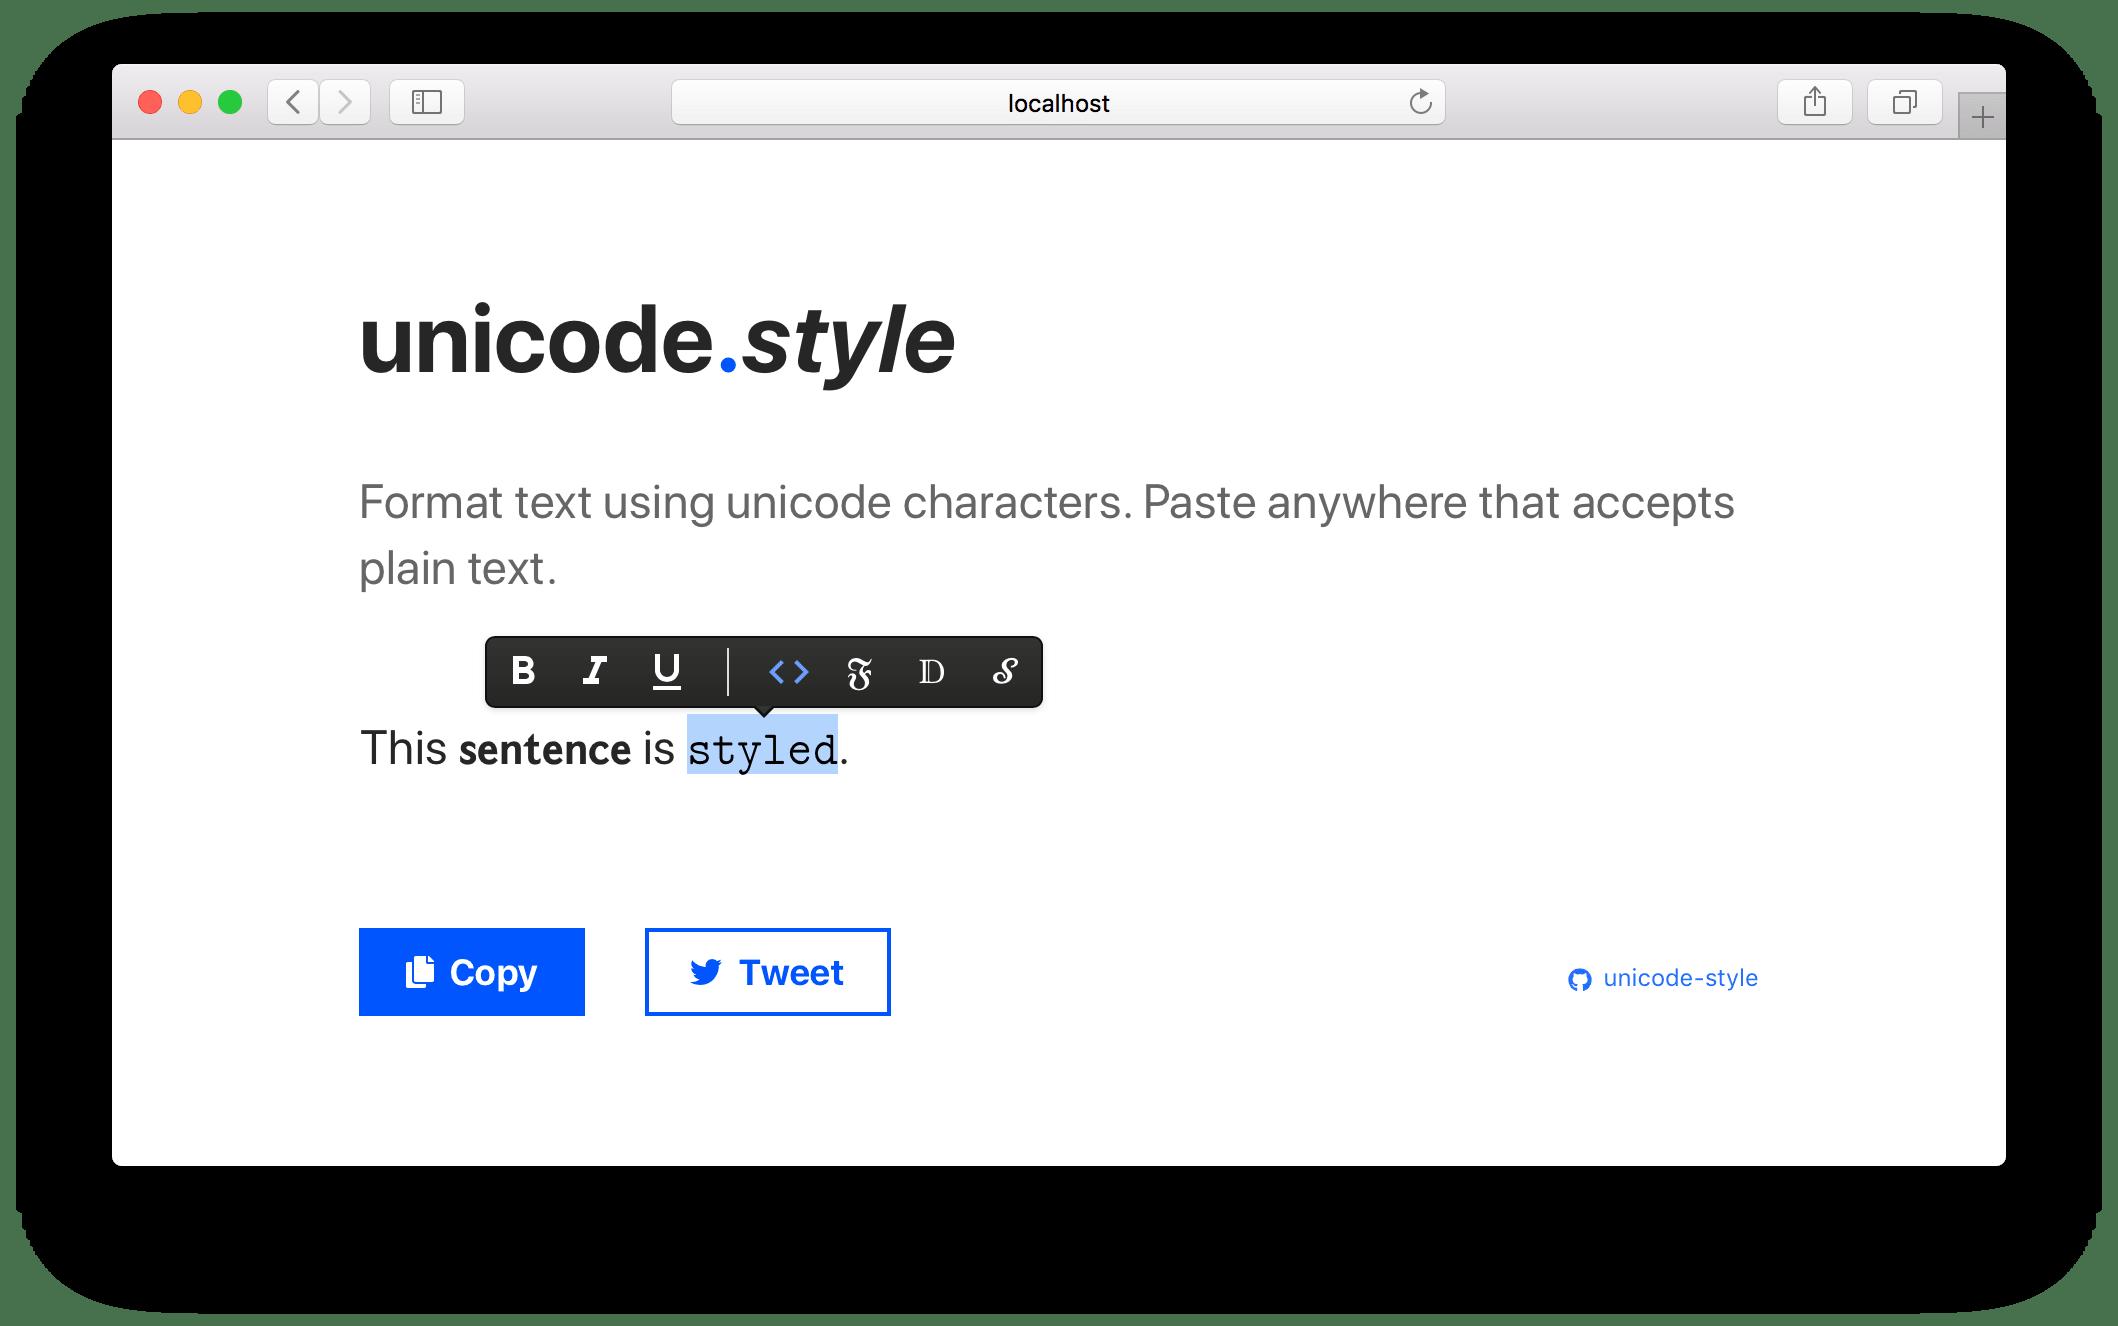 unicode-style